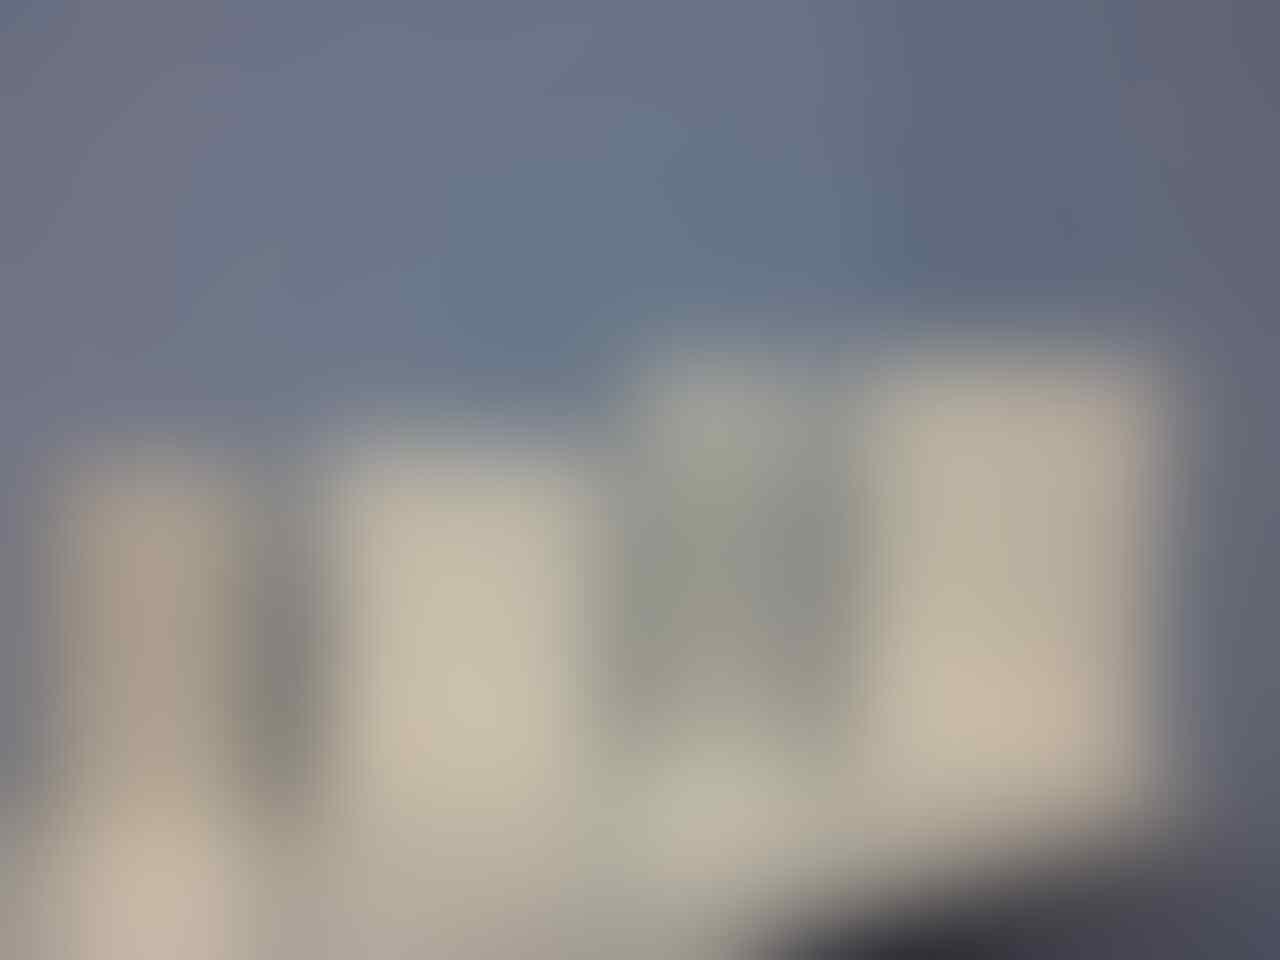 DISTRIBUTOR POWERBANK XIAOMI 100% ORIGINAL 10.000 MAH & SILIKON POWER BANK XIAO MI